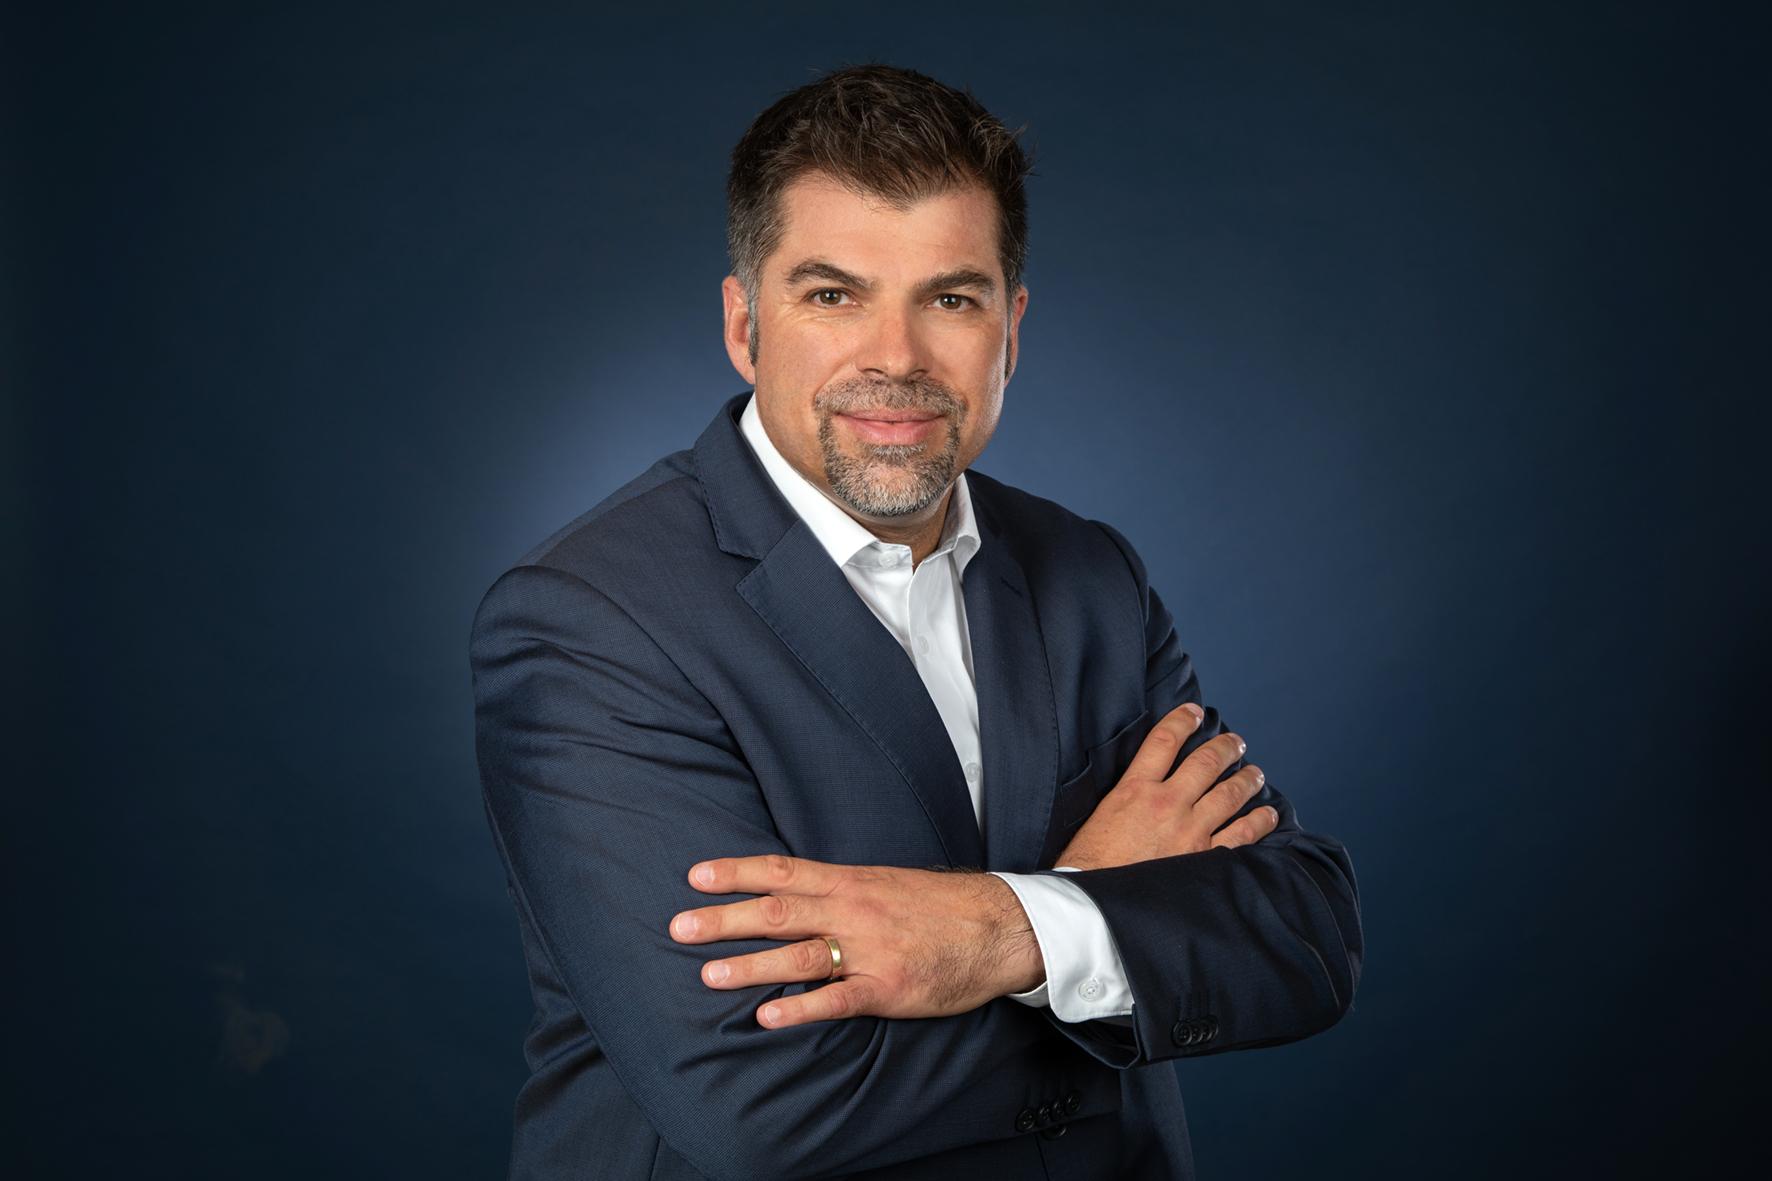 SAP-Partnervereinigung IA4SP professionalisiert sich